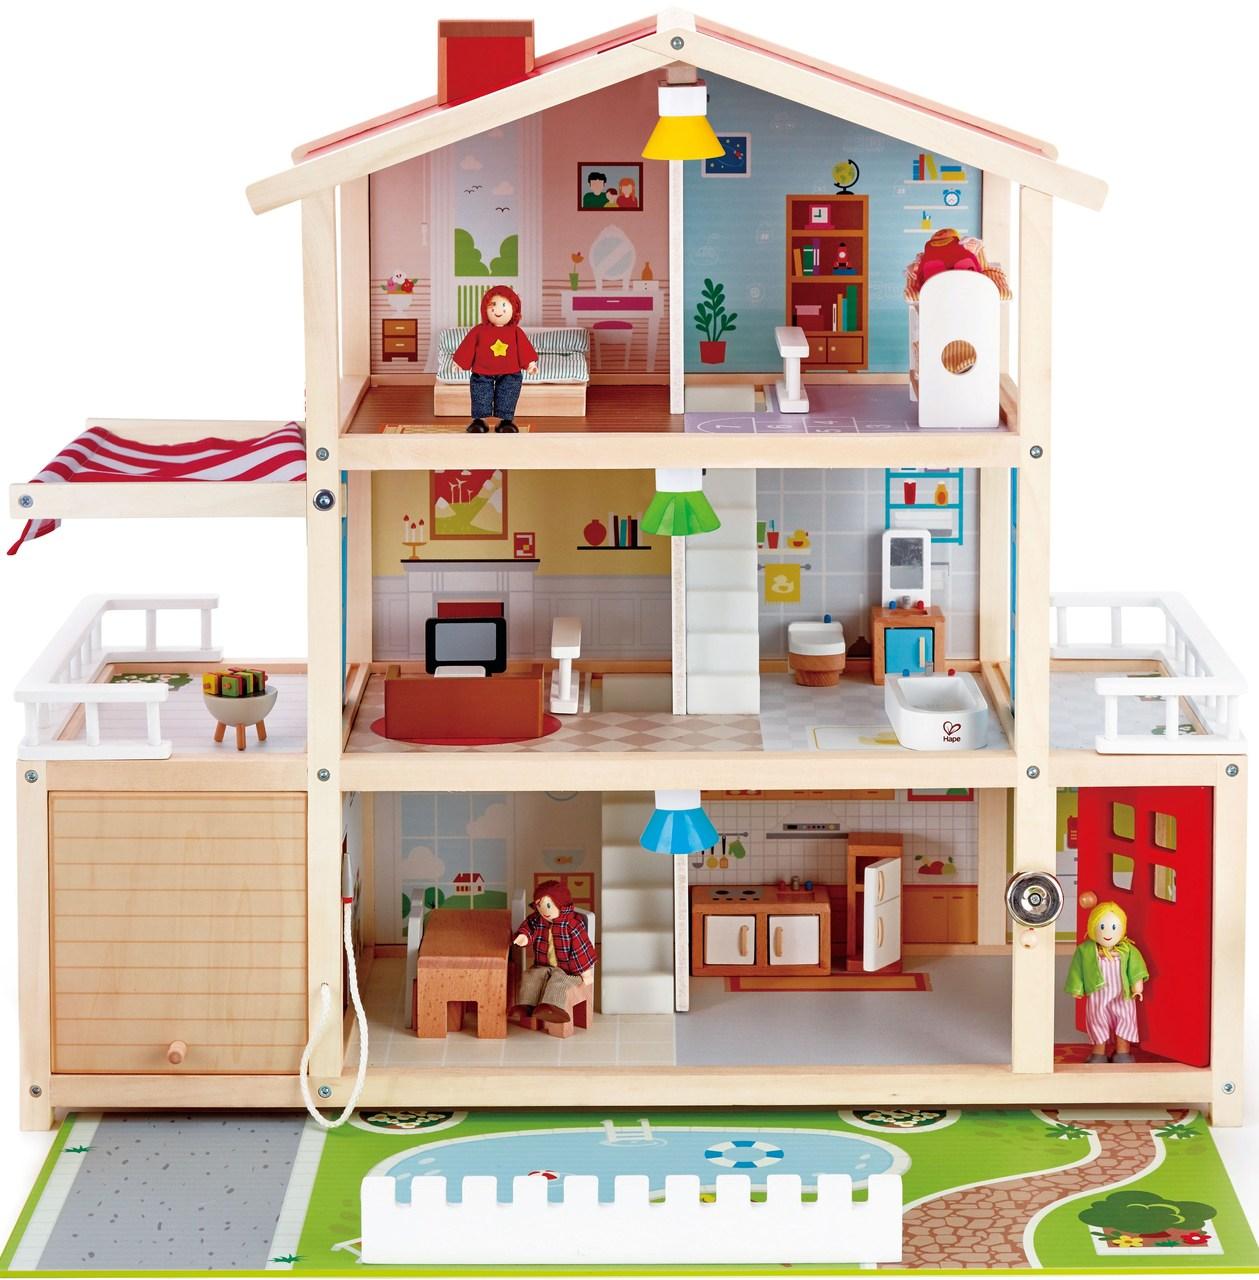 Hape Children S Room Wooden Doll Furniture